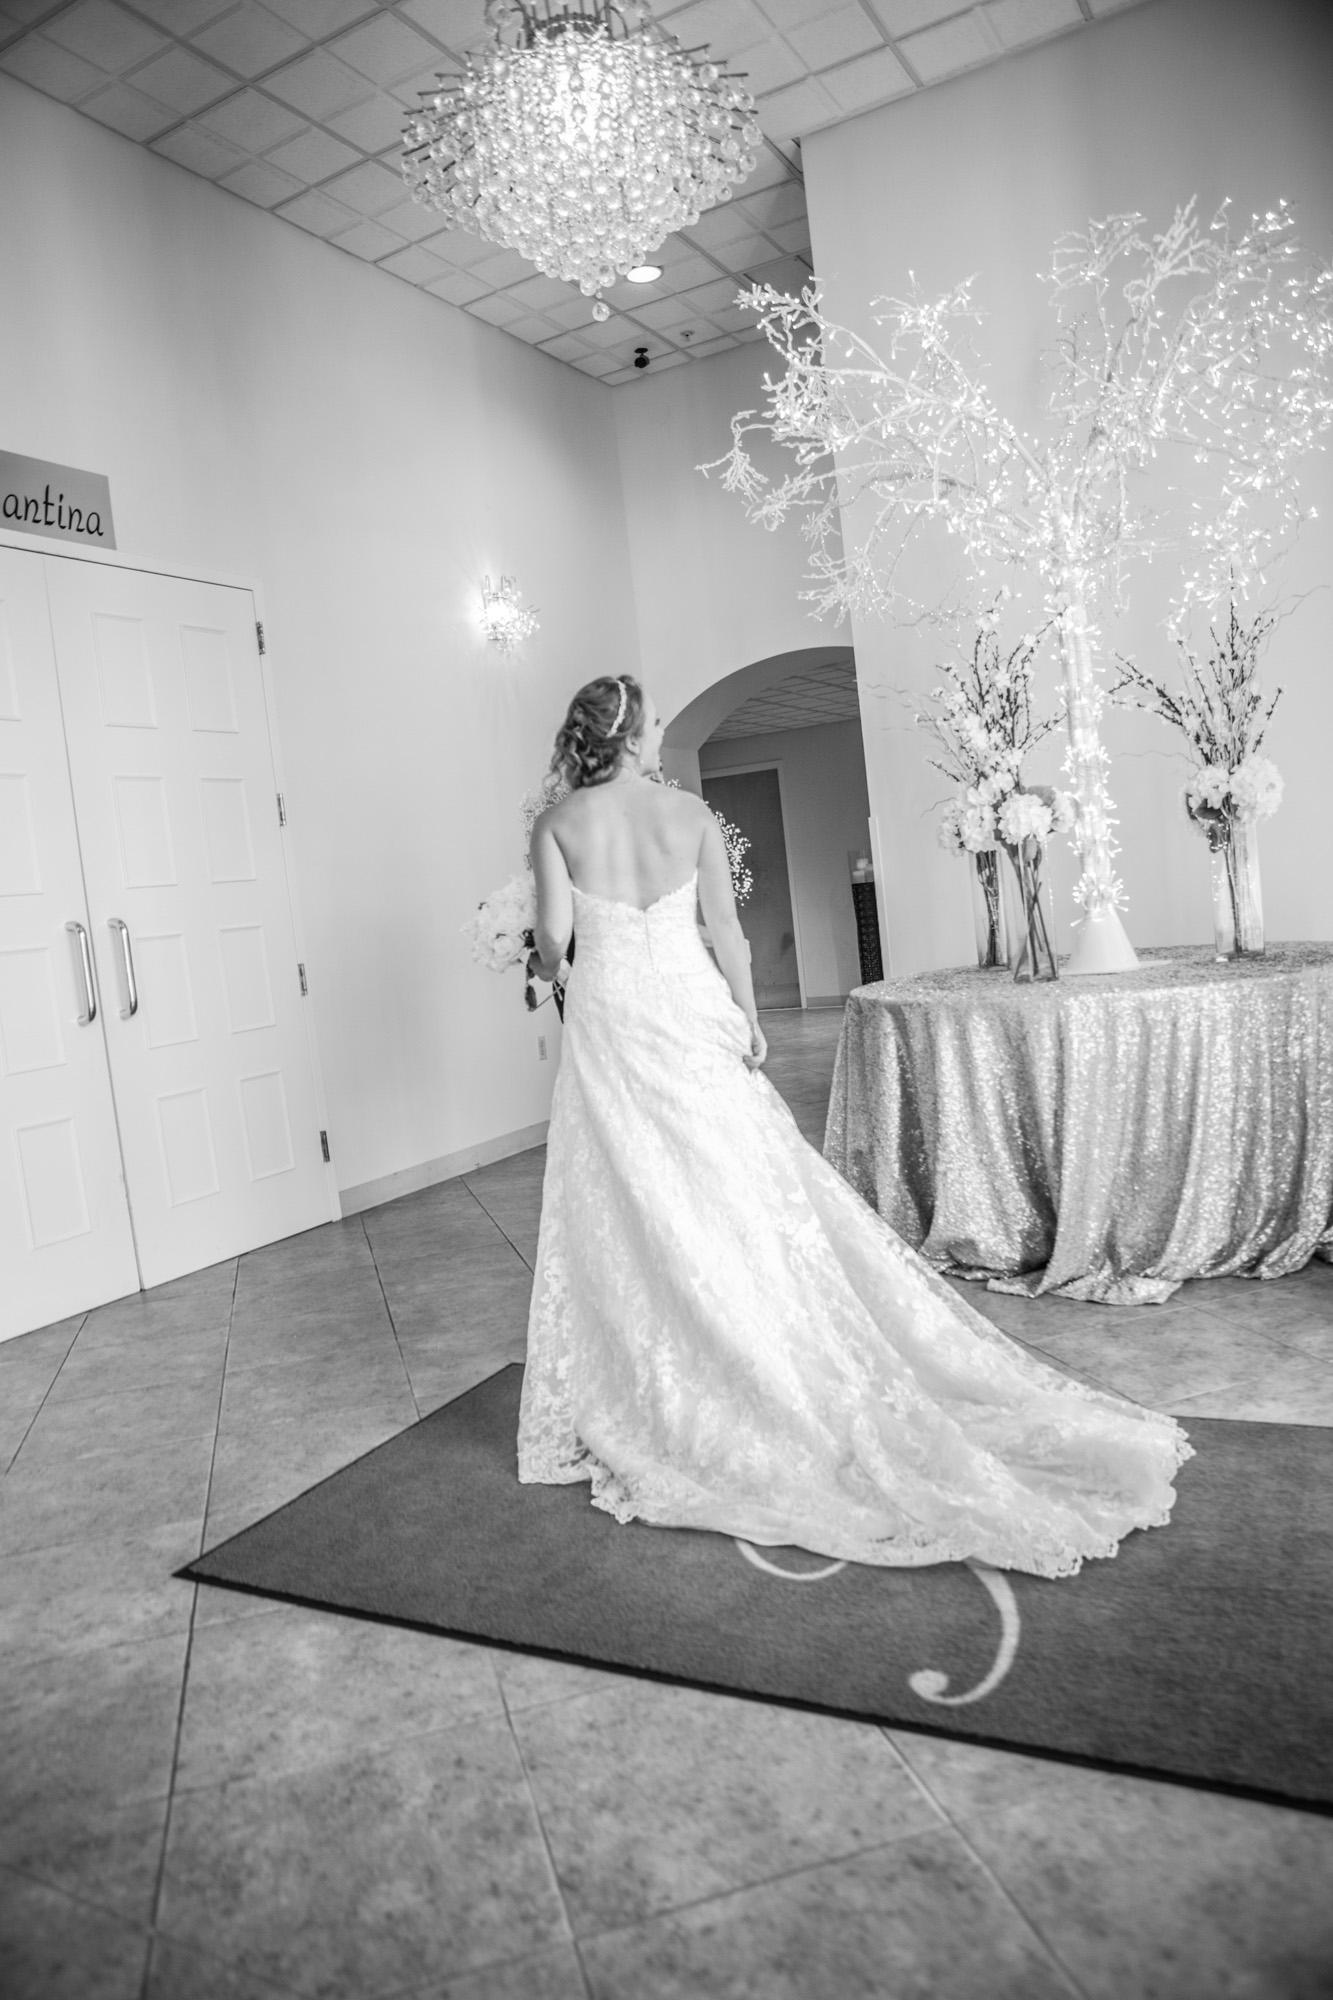 scranton_wedding_photographer_lettieri_pa (36 of 47).jpg